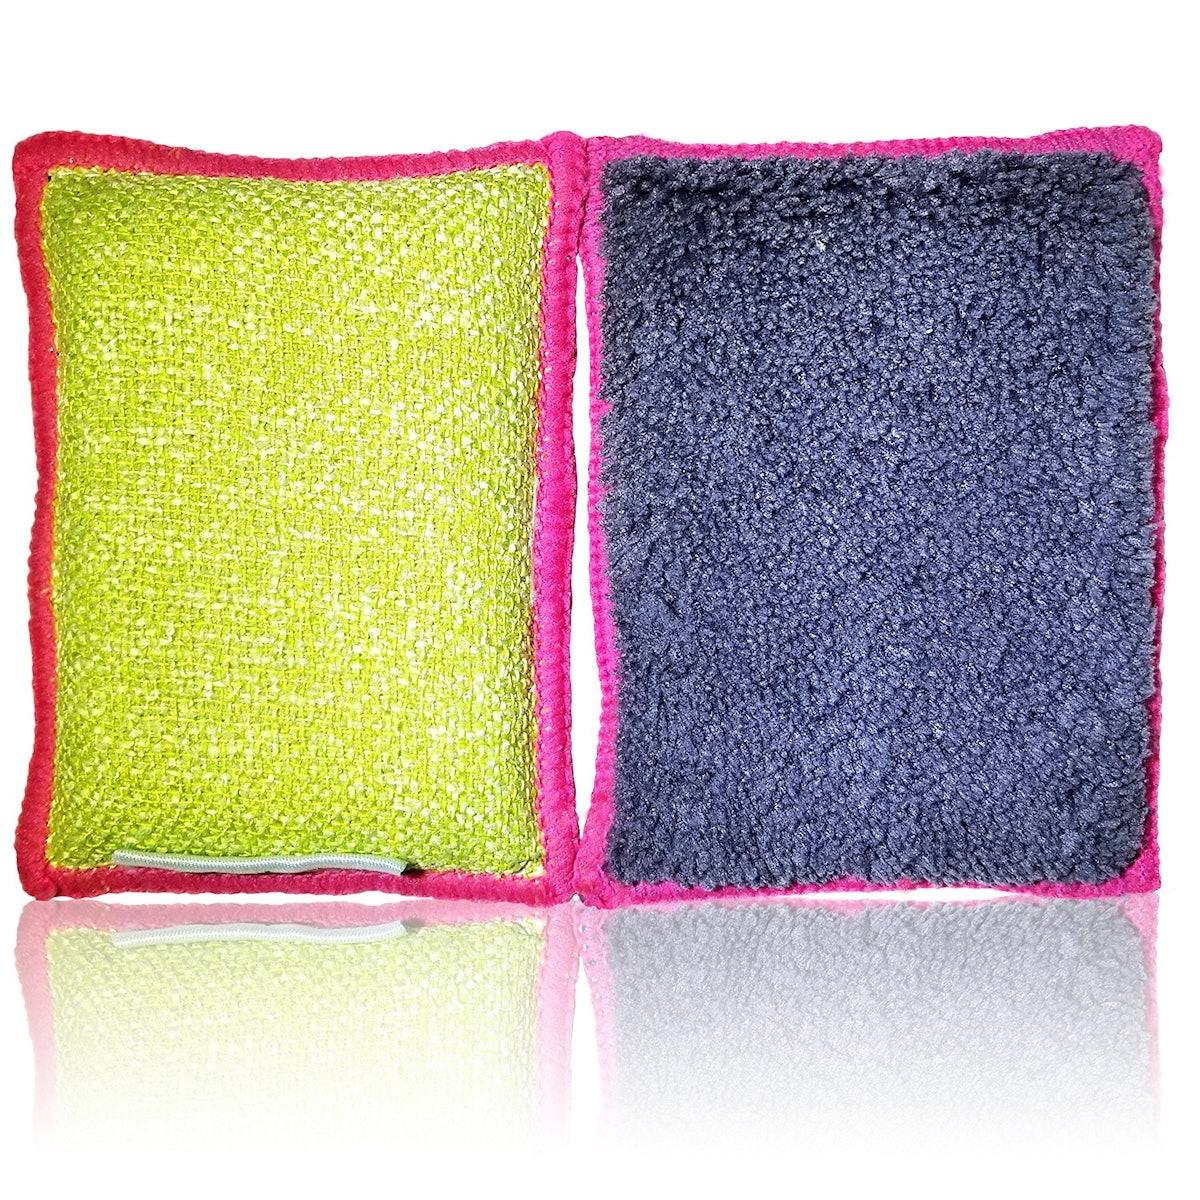 Nano Sponge Kitchen Cleaning Sponges